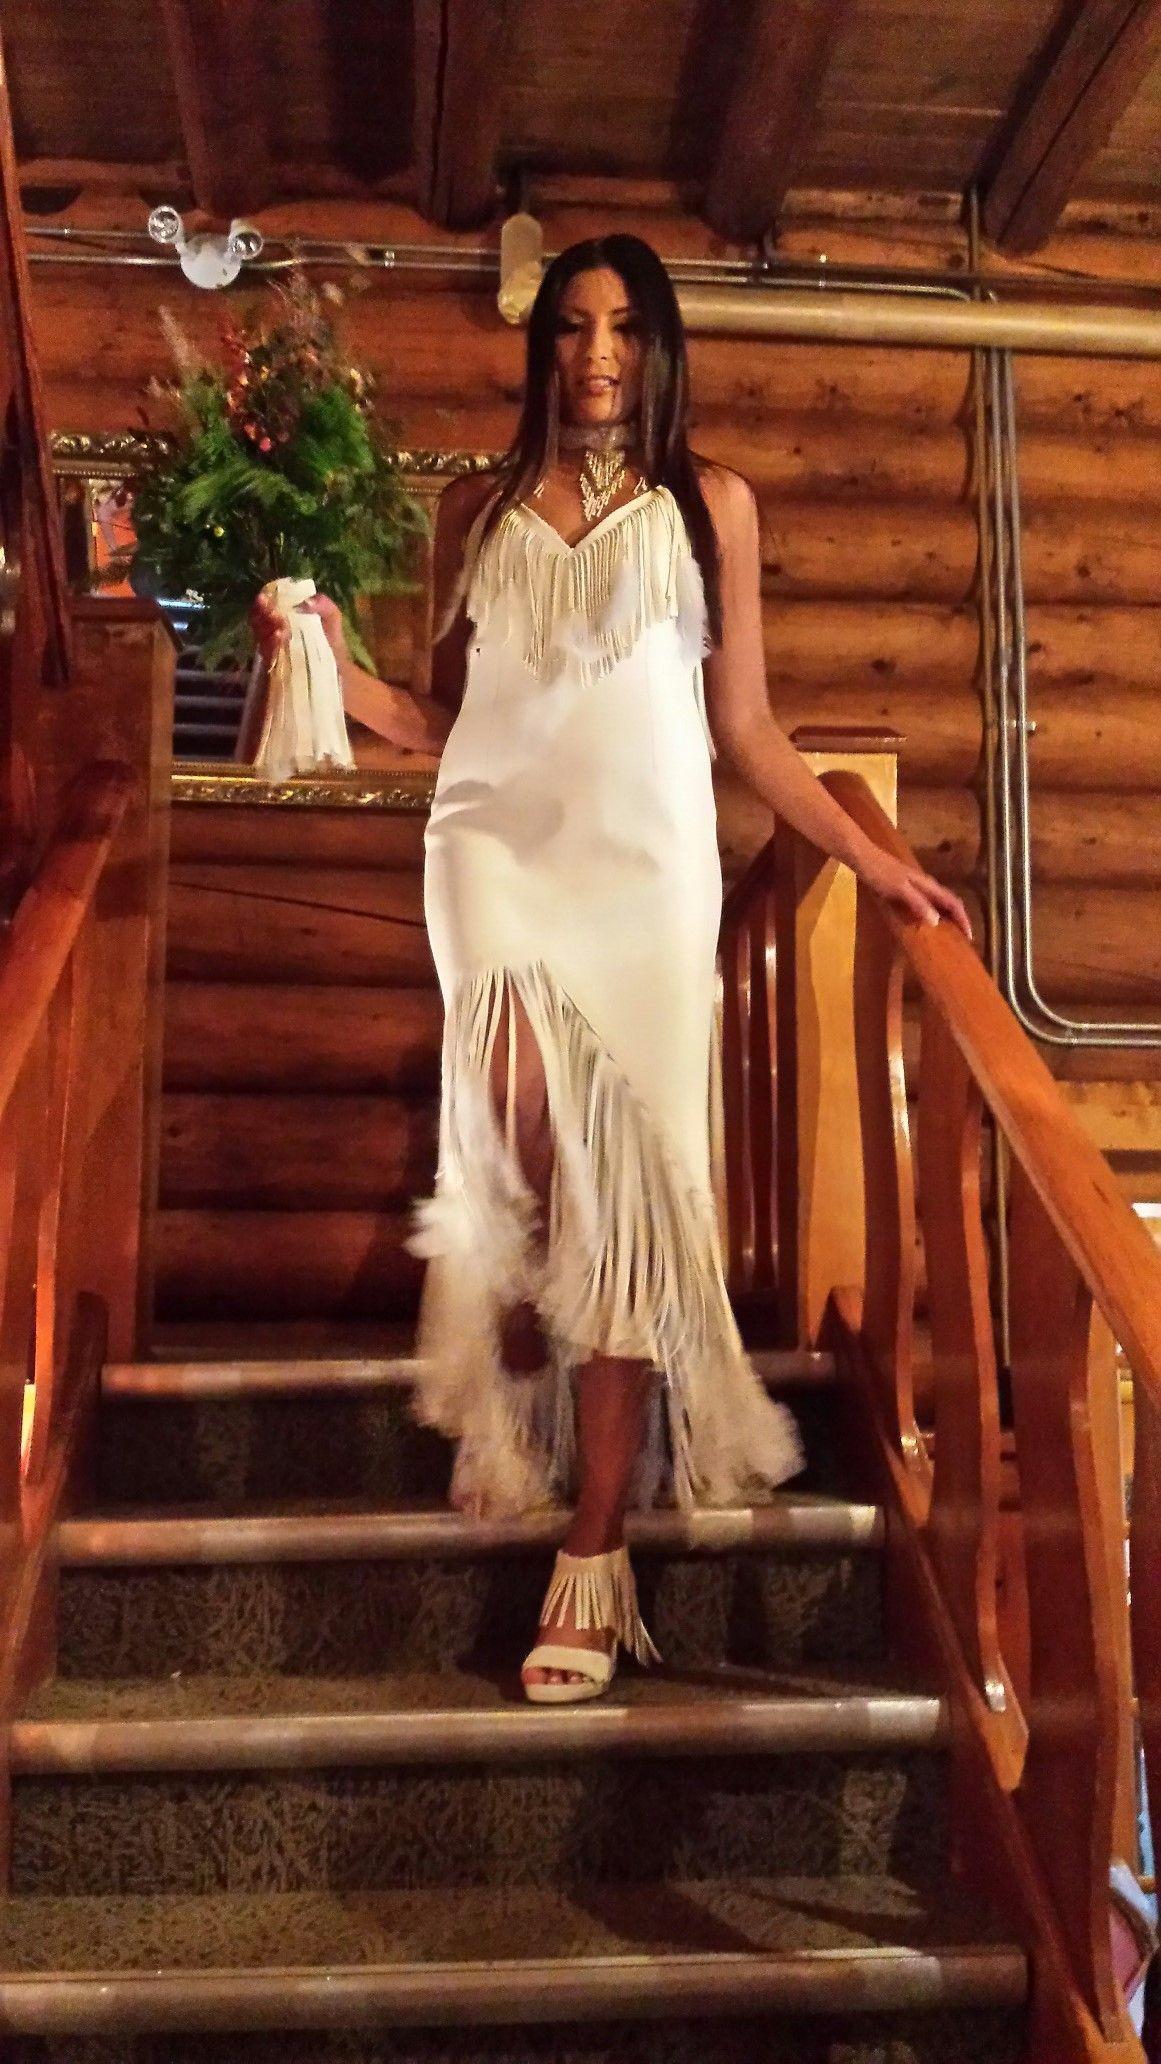 Native american wedding dress  Pin by Ken Mar on Lovely feminine clothing my humble biased